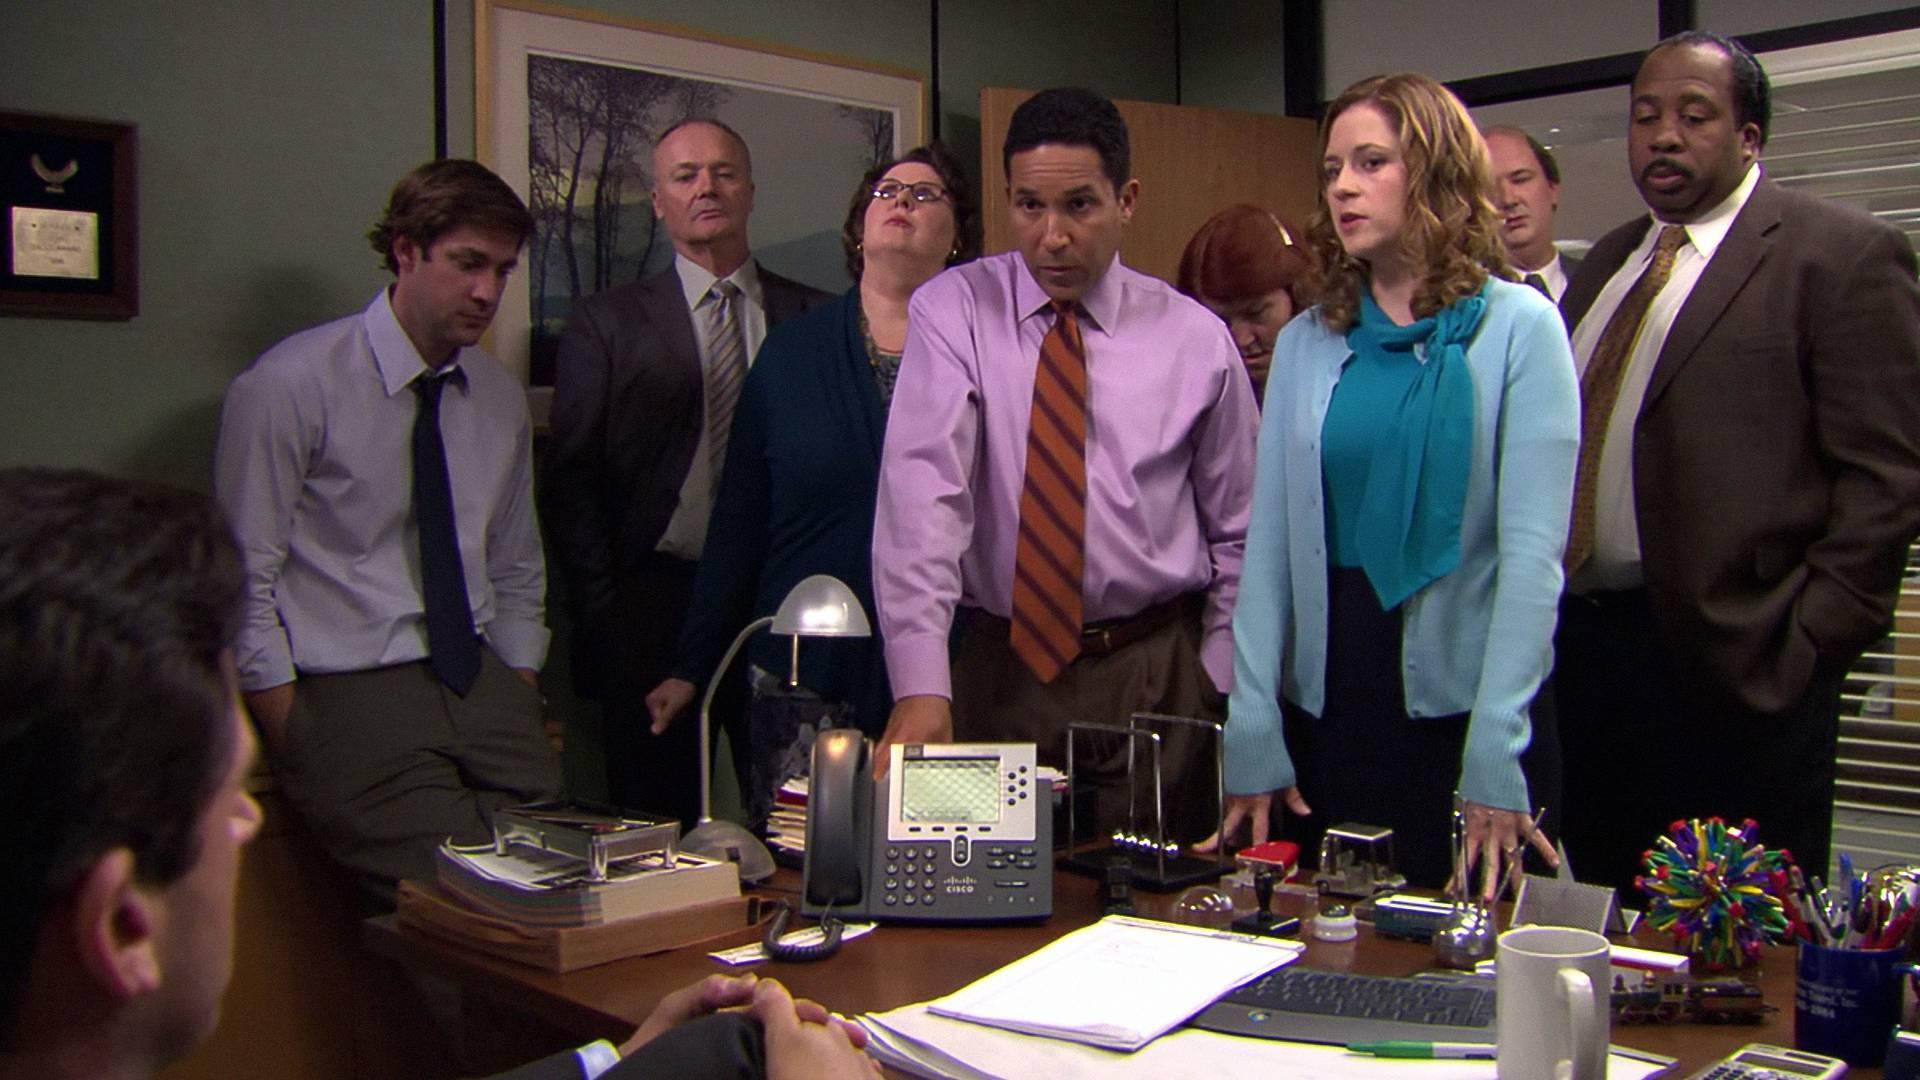 The Office Season 5 Episode 10